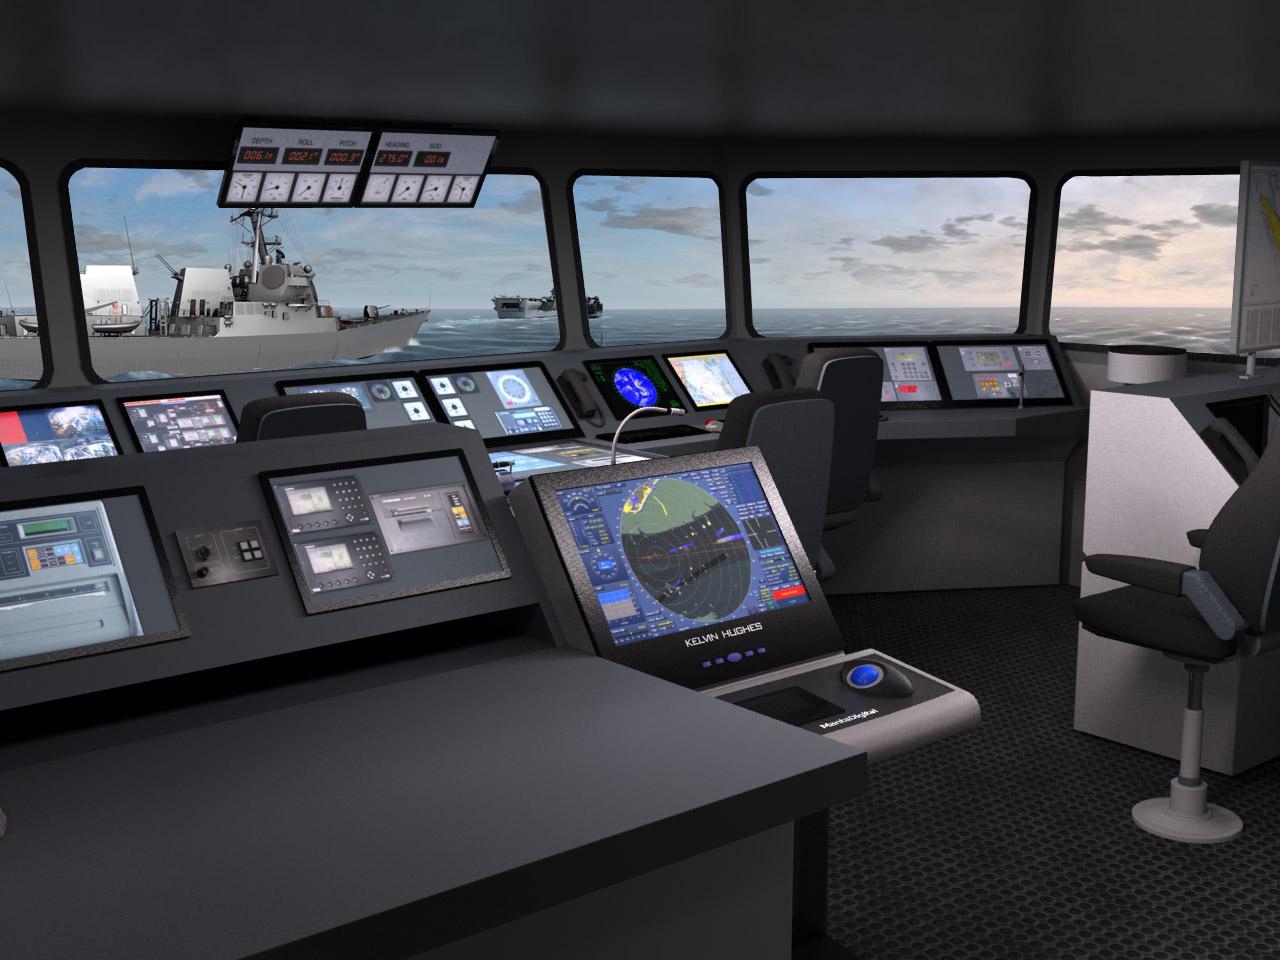 DEFENSE STUDIES: Indonesian Navy Selects NAUTIS Class A FMB